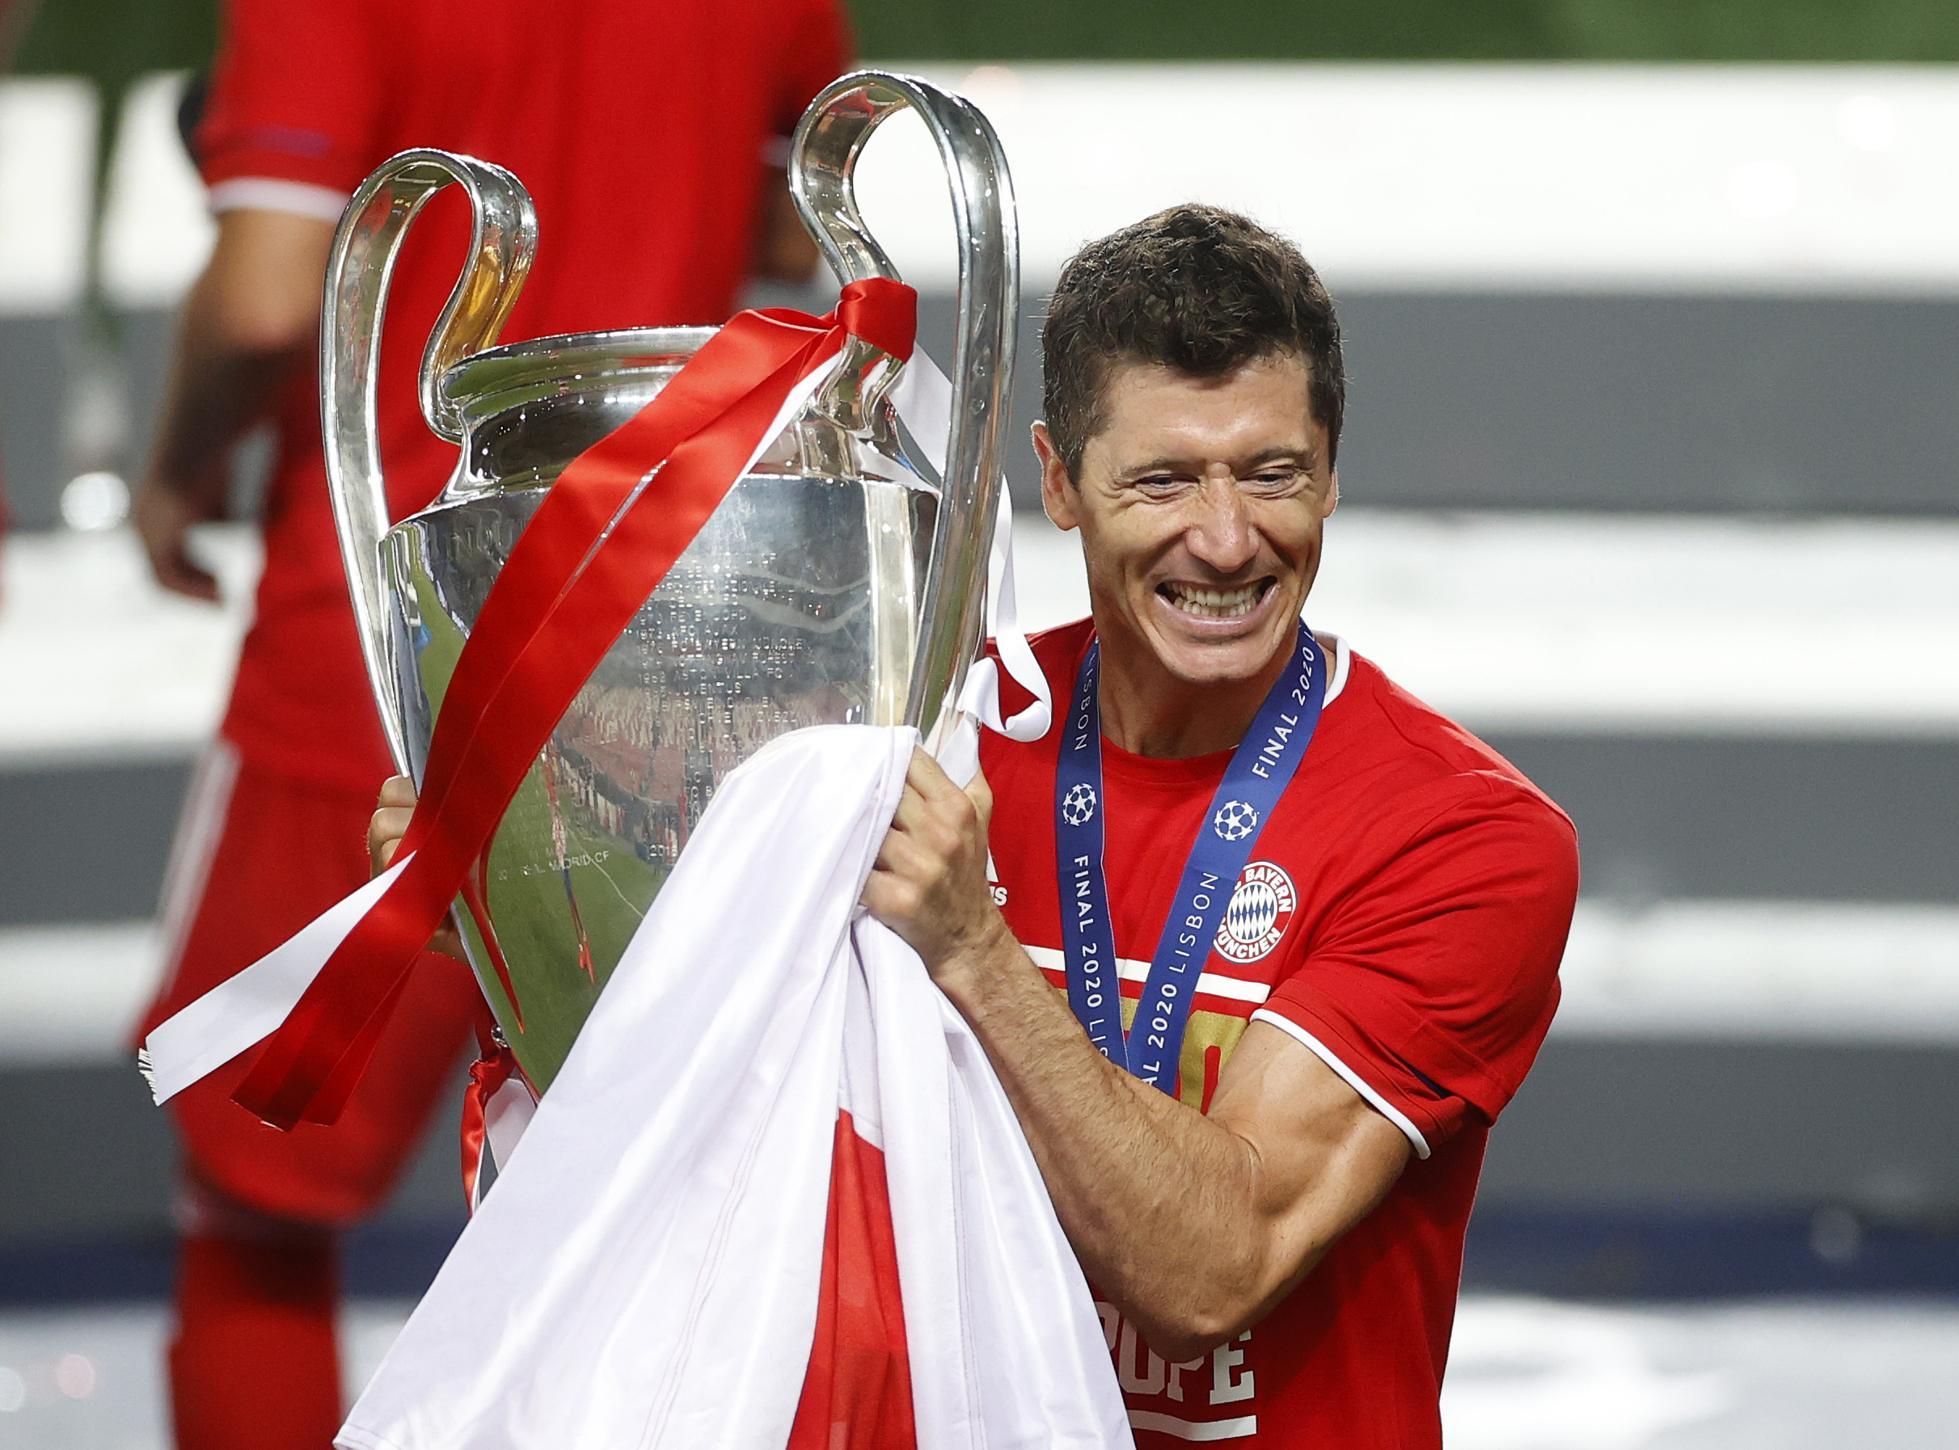 Robert Lewandowski of FC Bayern Munich with the UEFA Champions League Trophy following his team's victory over Paris Saint-Germain.